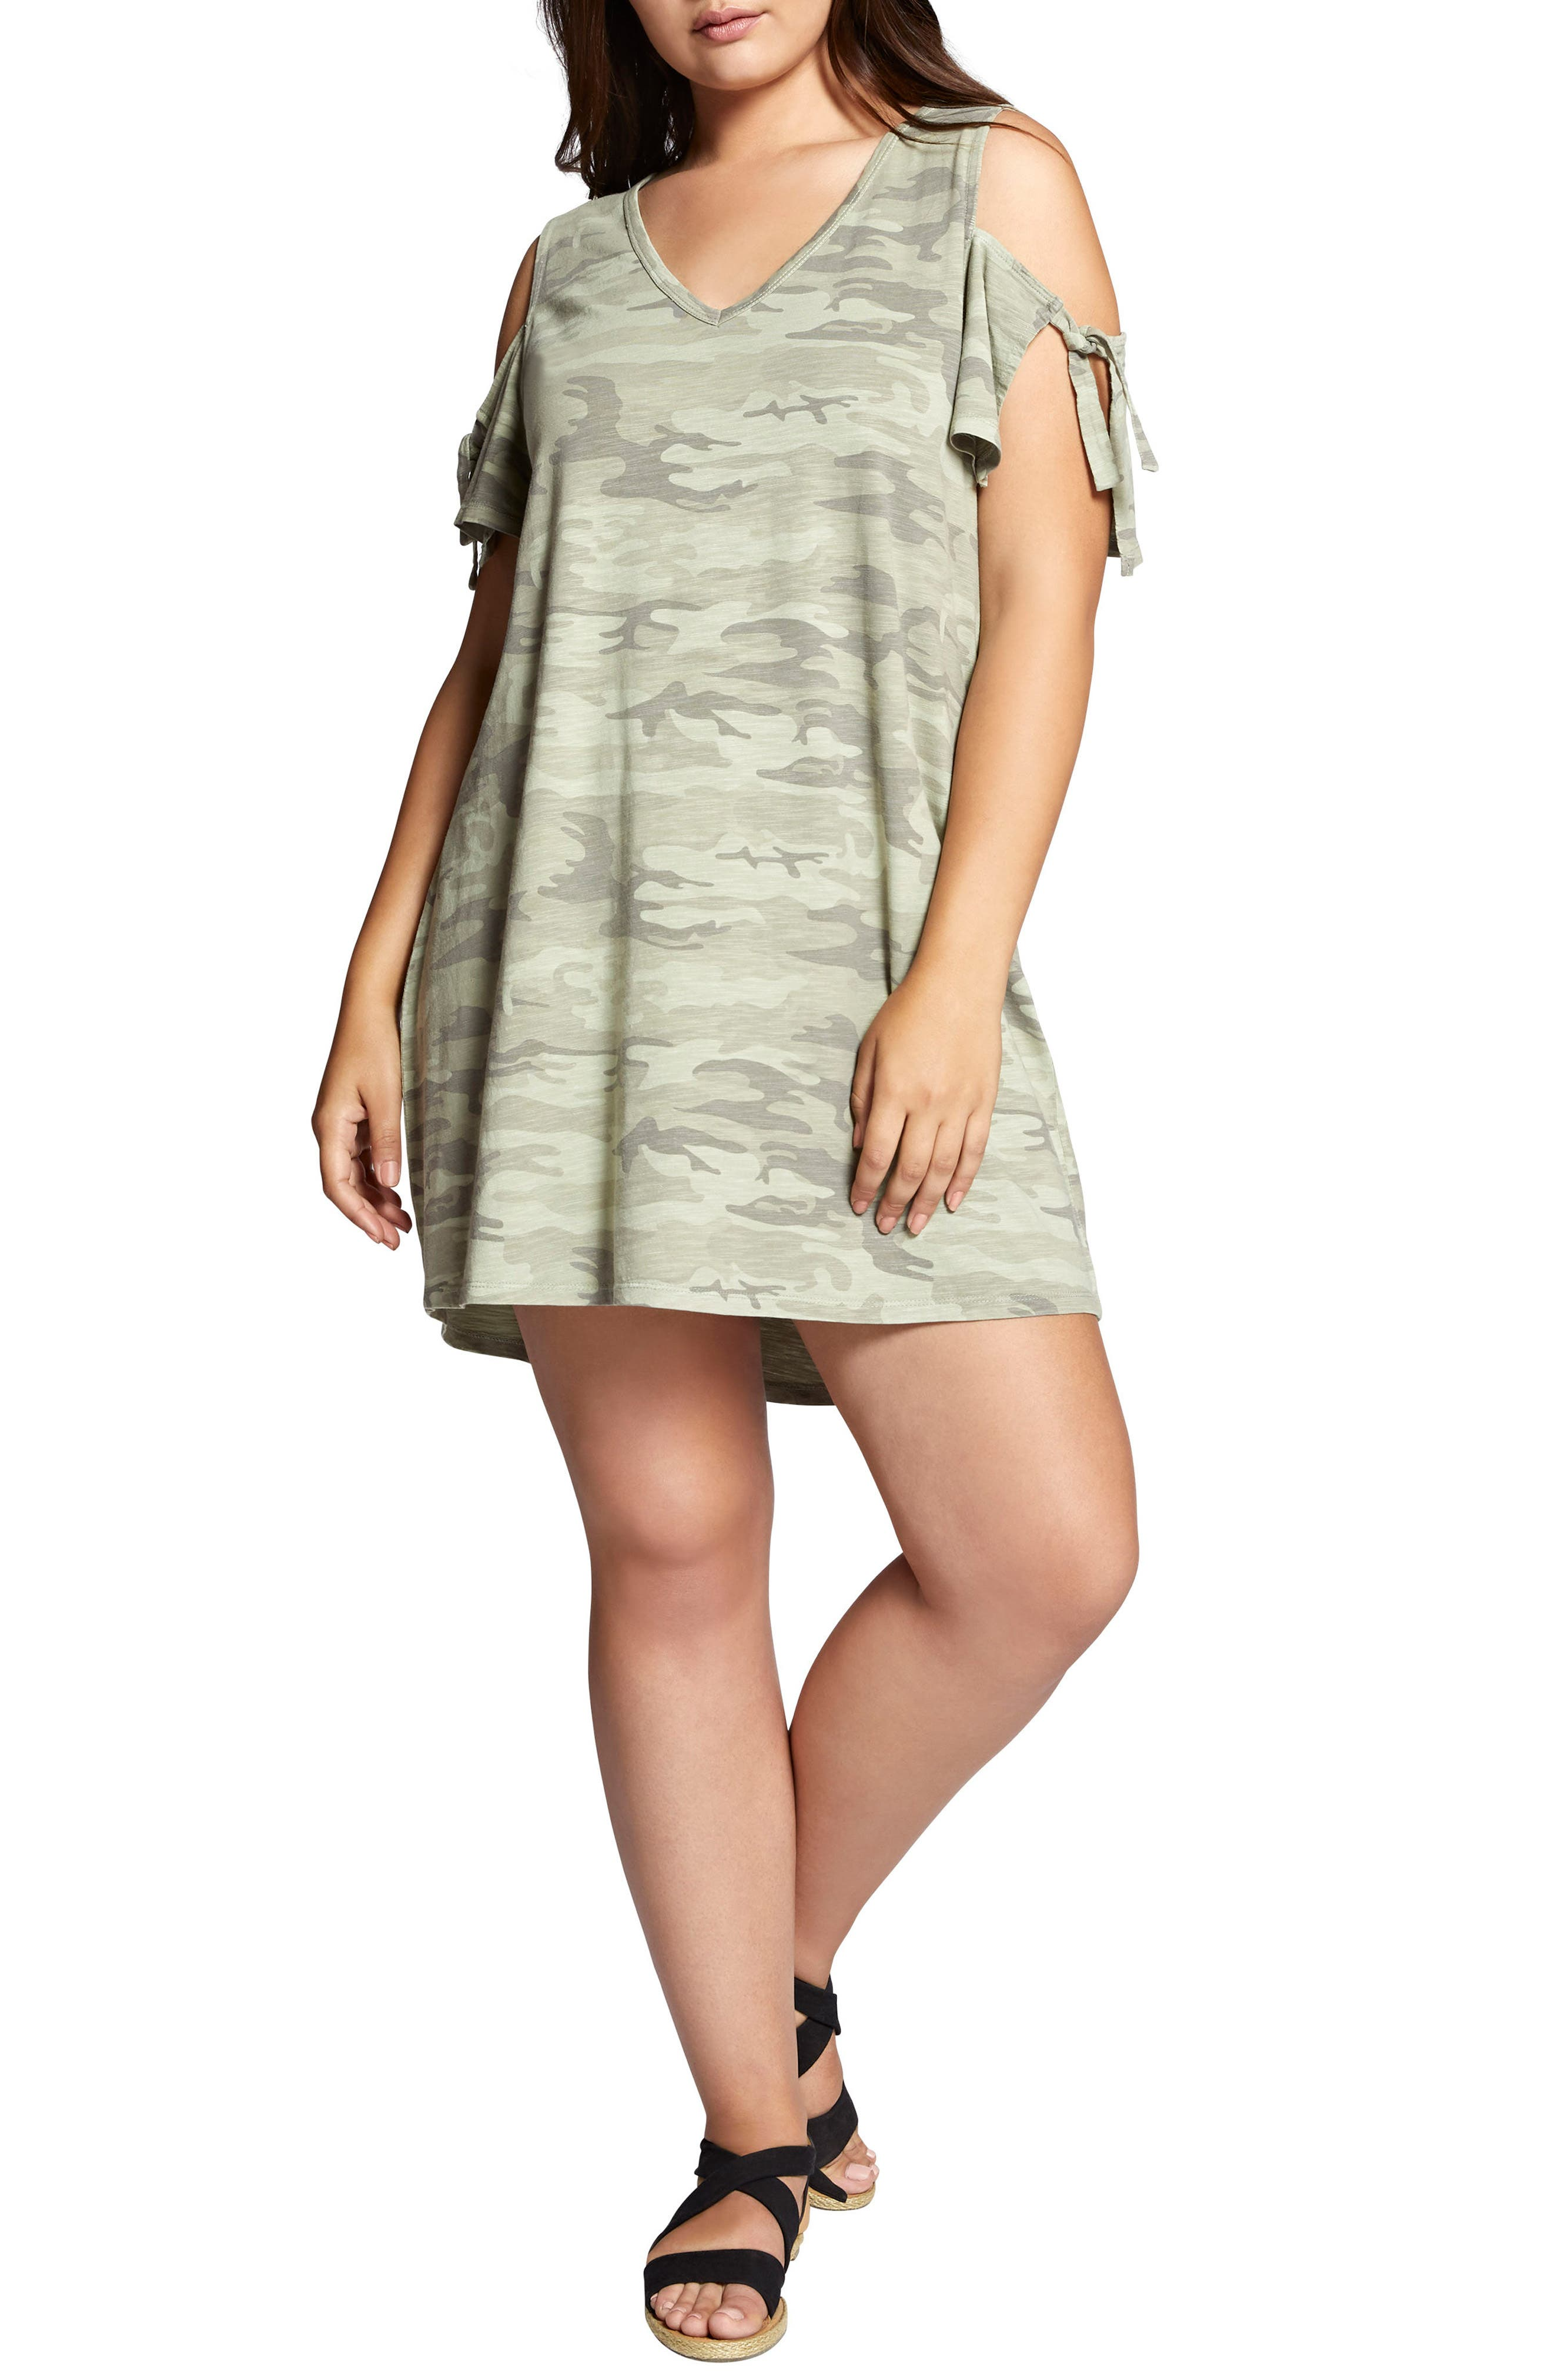 Lakeside Camo Cold Shoulder T-Shirt Dress,                             Main thumbnail 1, color,                             CADET CAMO